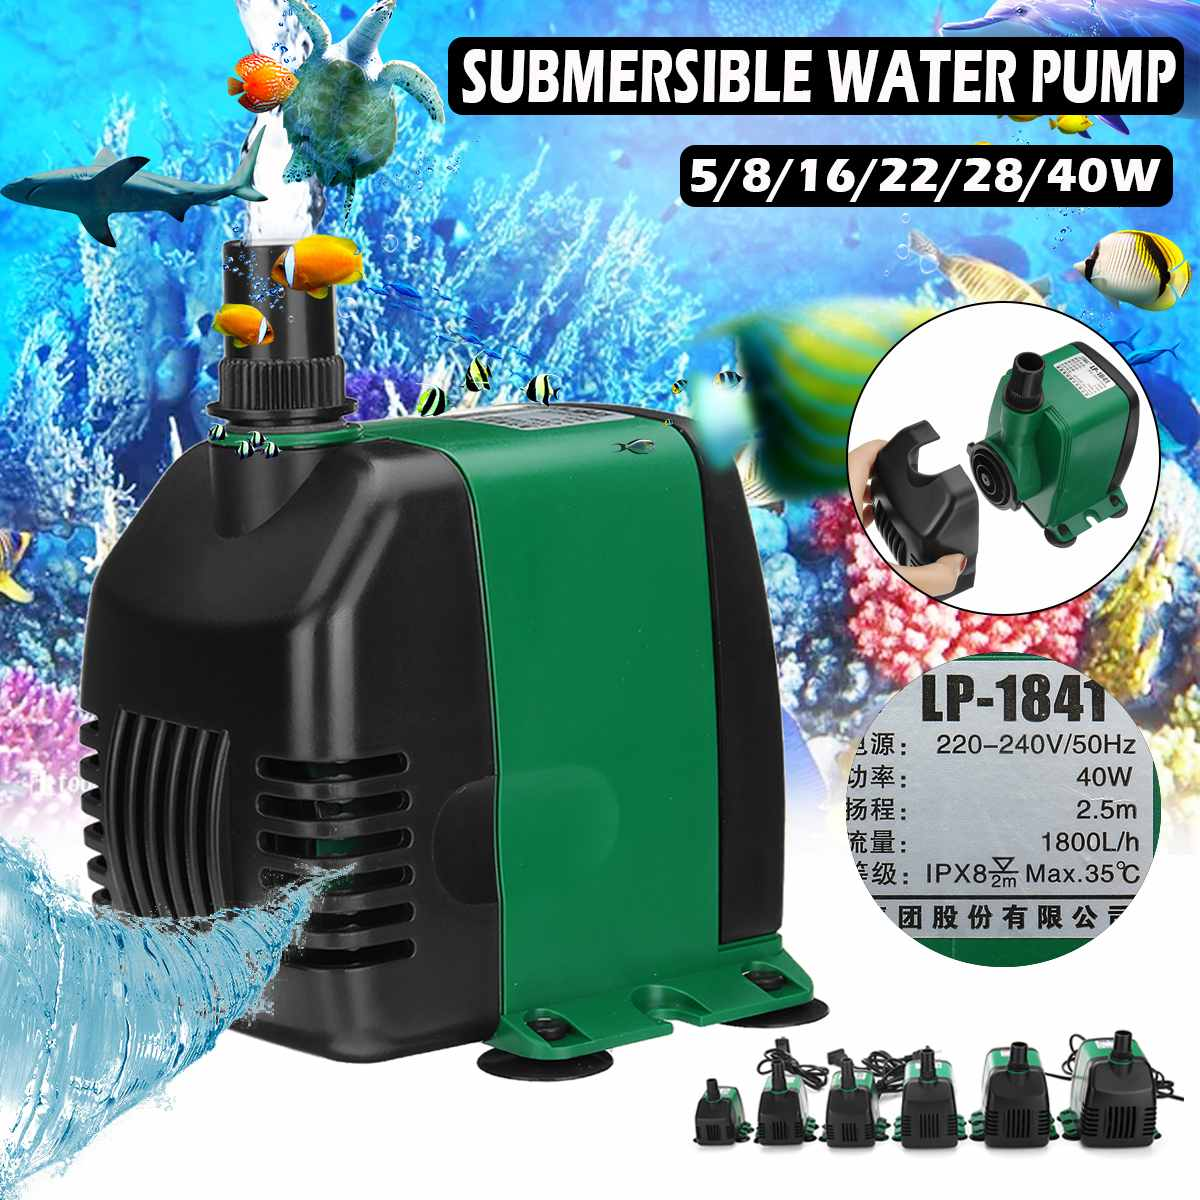 Bomba de agua de acuario multifuncional 5/8/16/22/28/40W 220V, bomba de agua de estanque sumergible para estanque